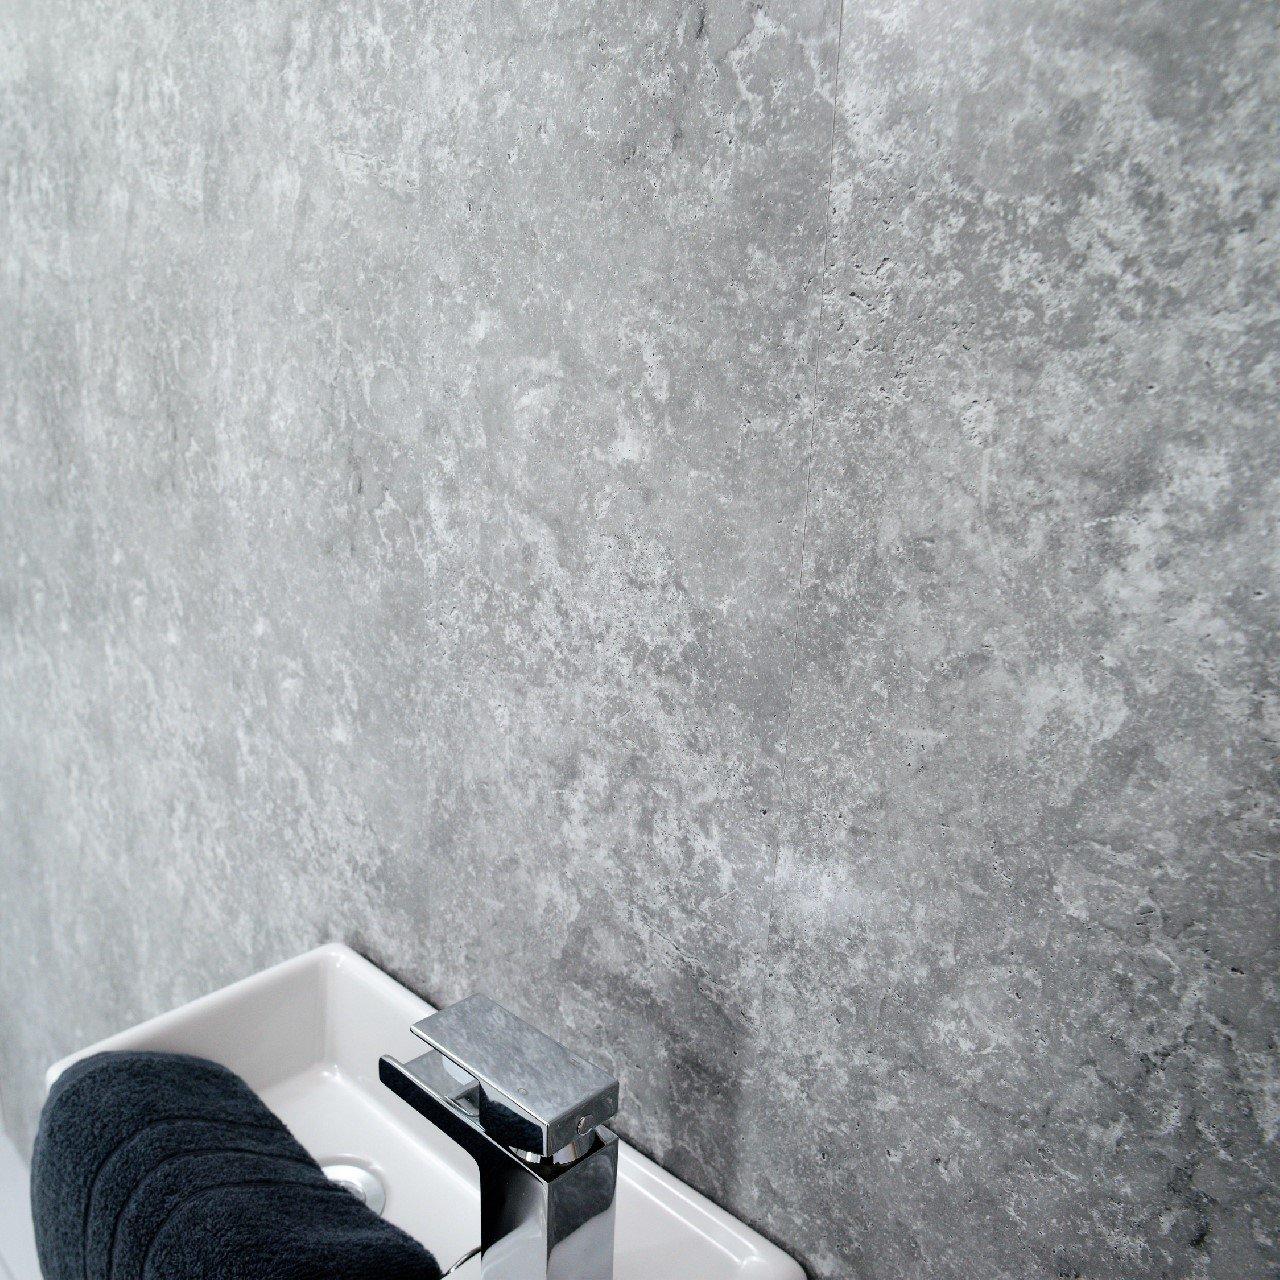 Grey Panels Splashbacks Grey Cladding-PVC-for Bathroom Shower Cladding Wall Panels Splashbacks-Ceiling Panels Splashbacks- Grey Concrete-100% Waterproof-by Claddtech (6 Panel Pack)